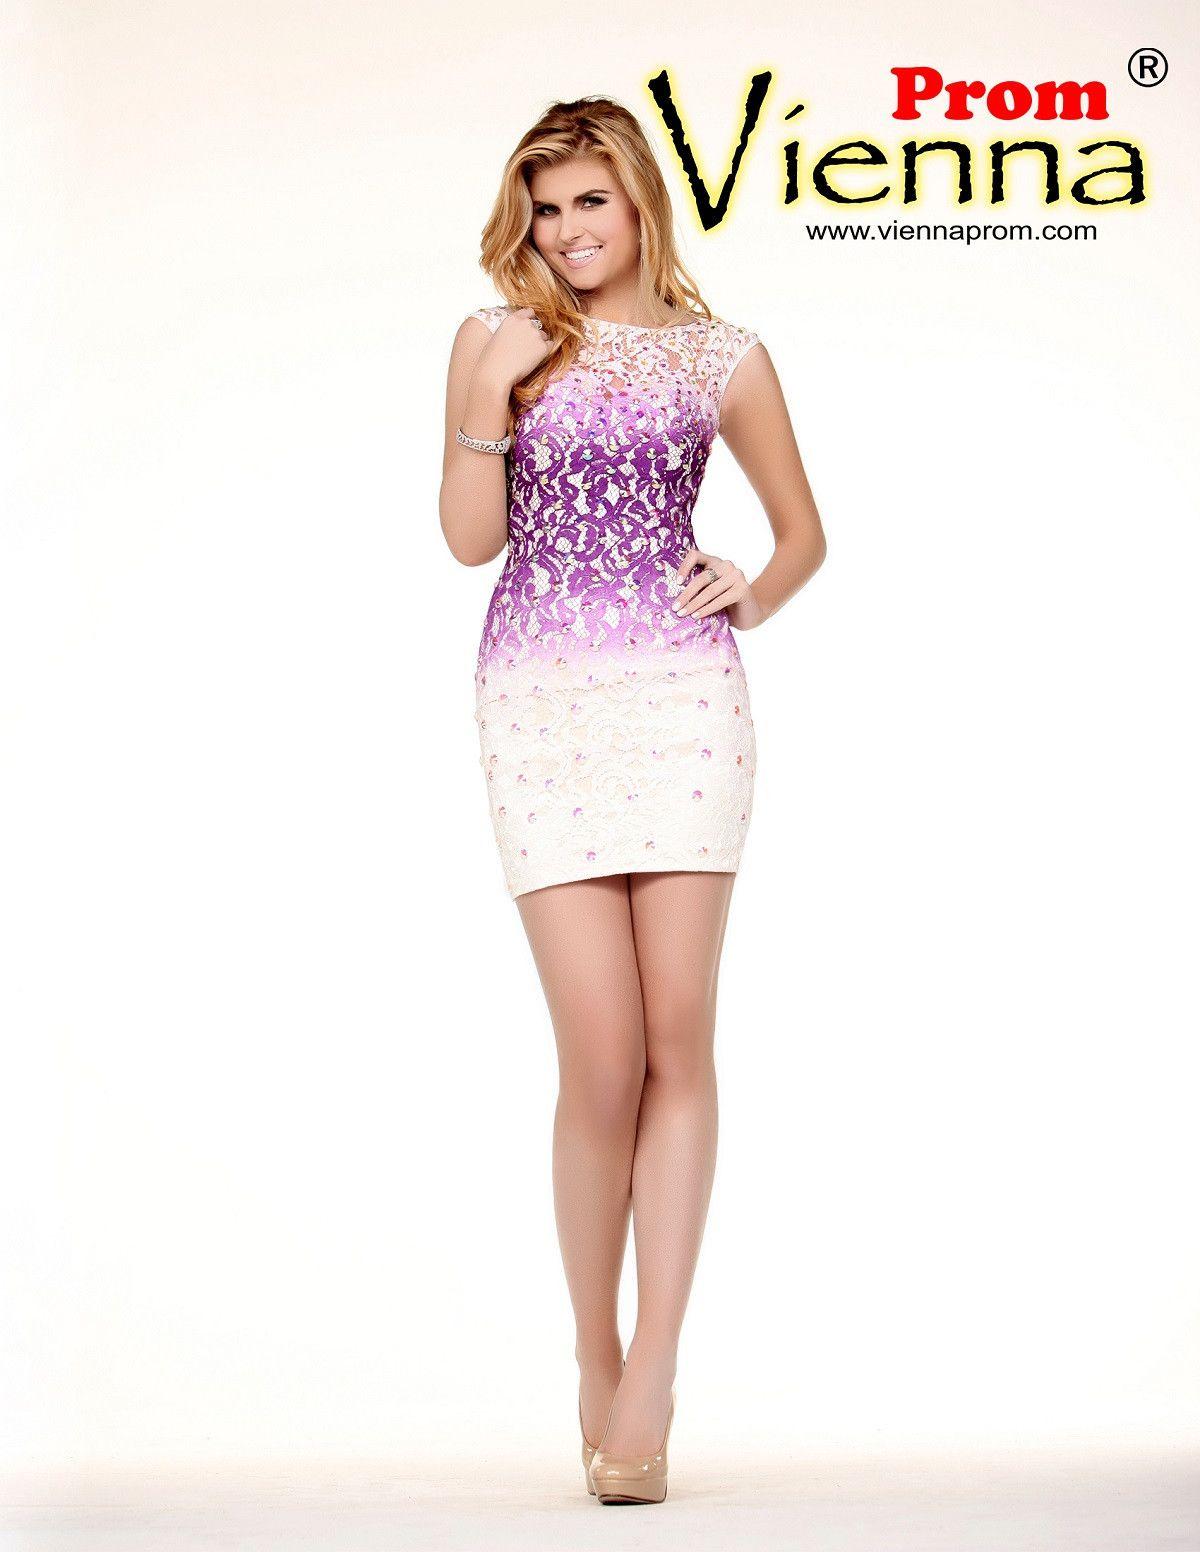 Vienna Prom 1003 Short Homecoming Dress Dresses Short Homecoming Dress Homecoming Dresses [ 1552 x 1200 Pixel ]